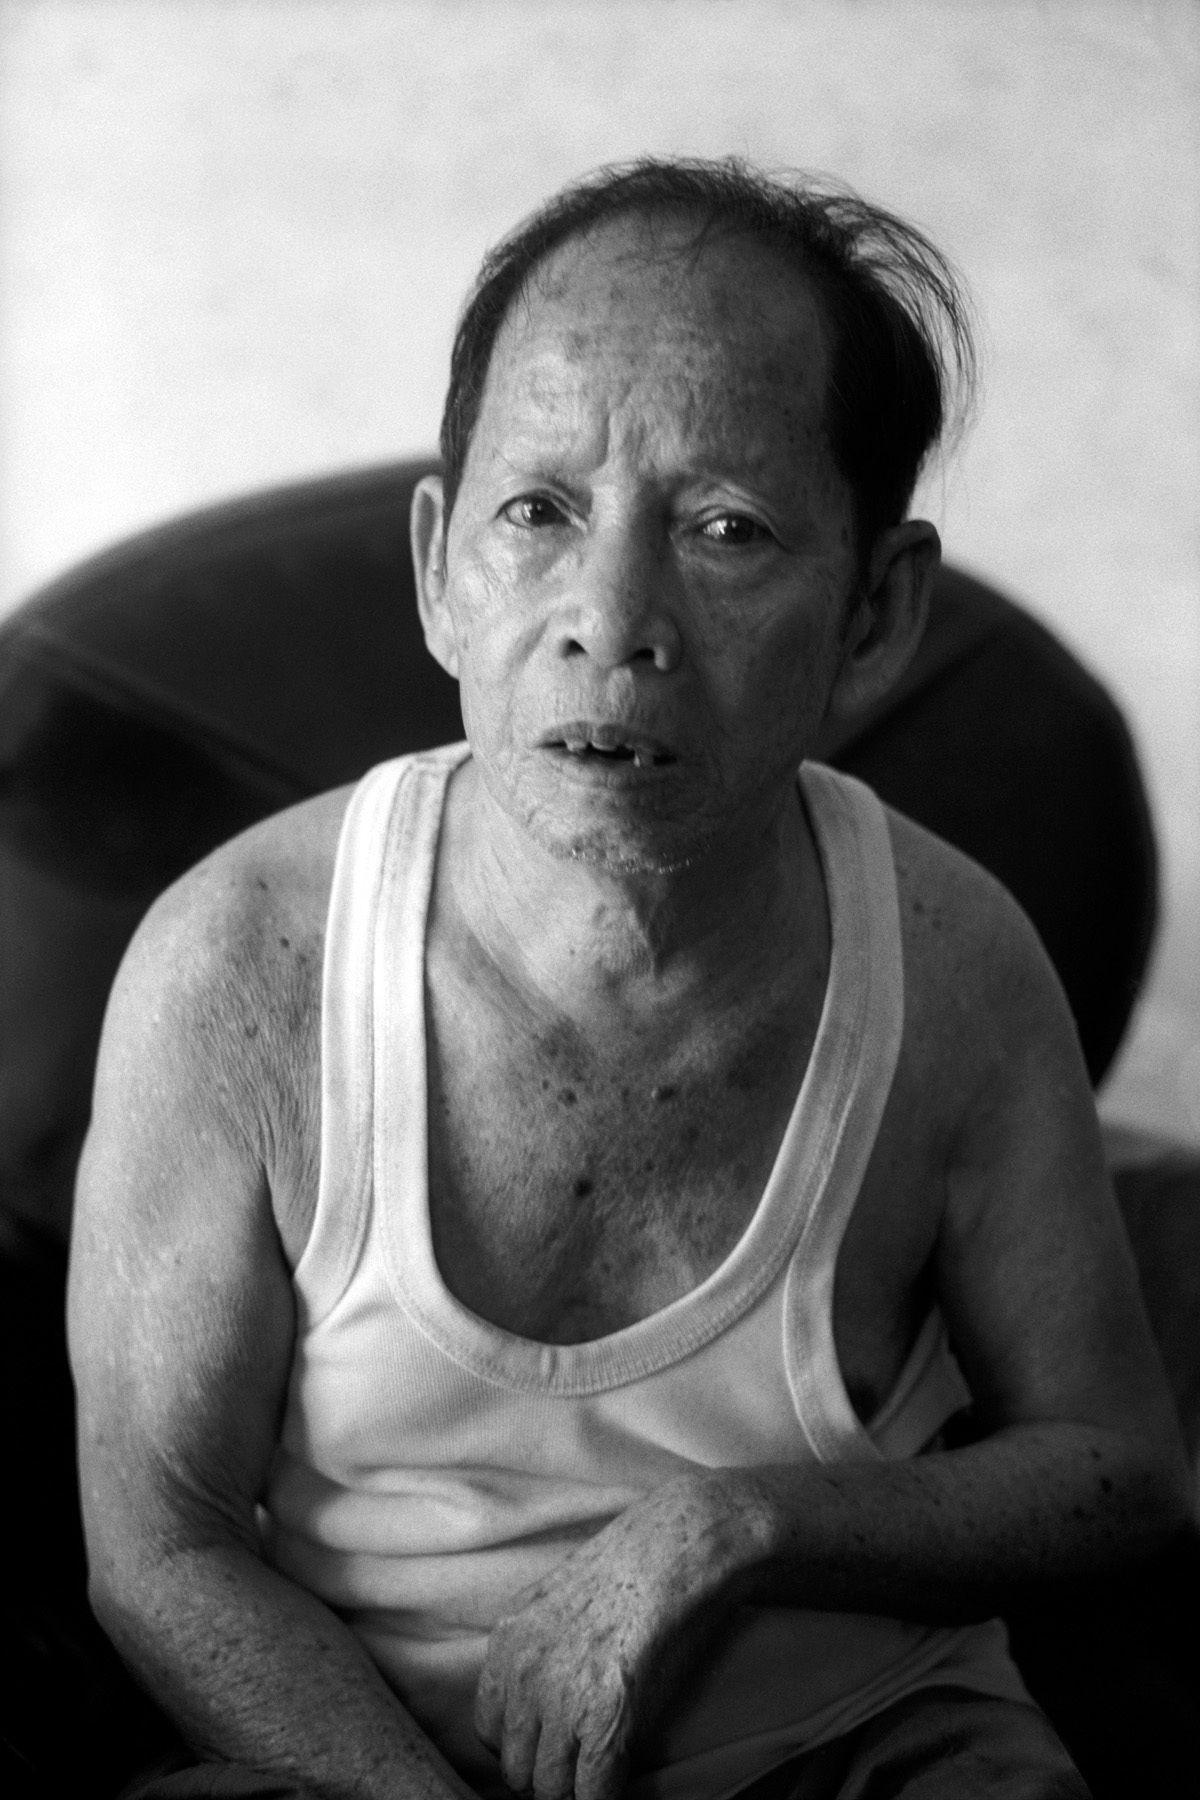 NGUYEN LAM TOI2012